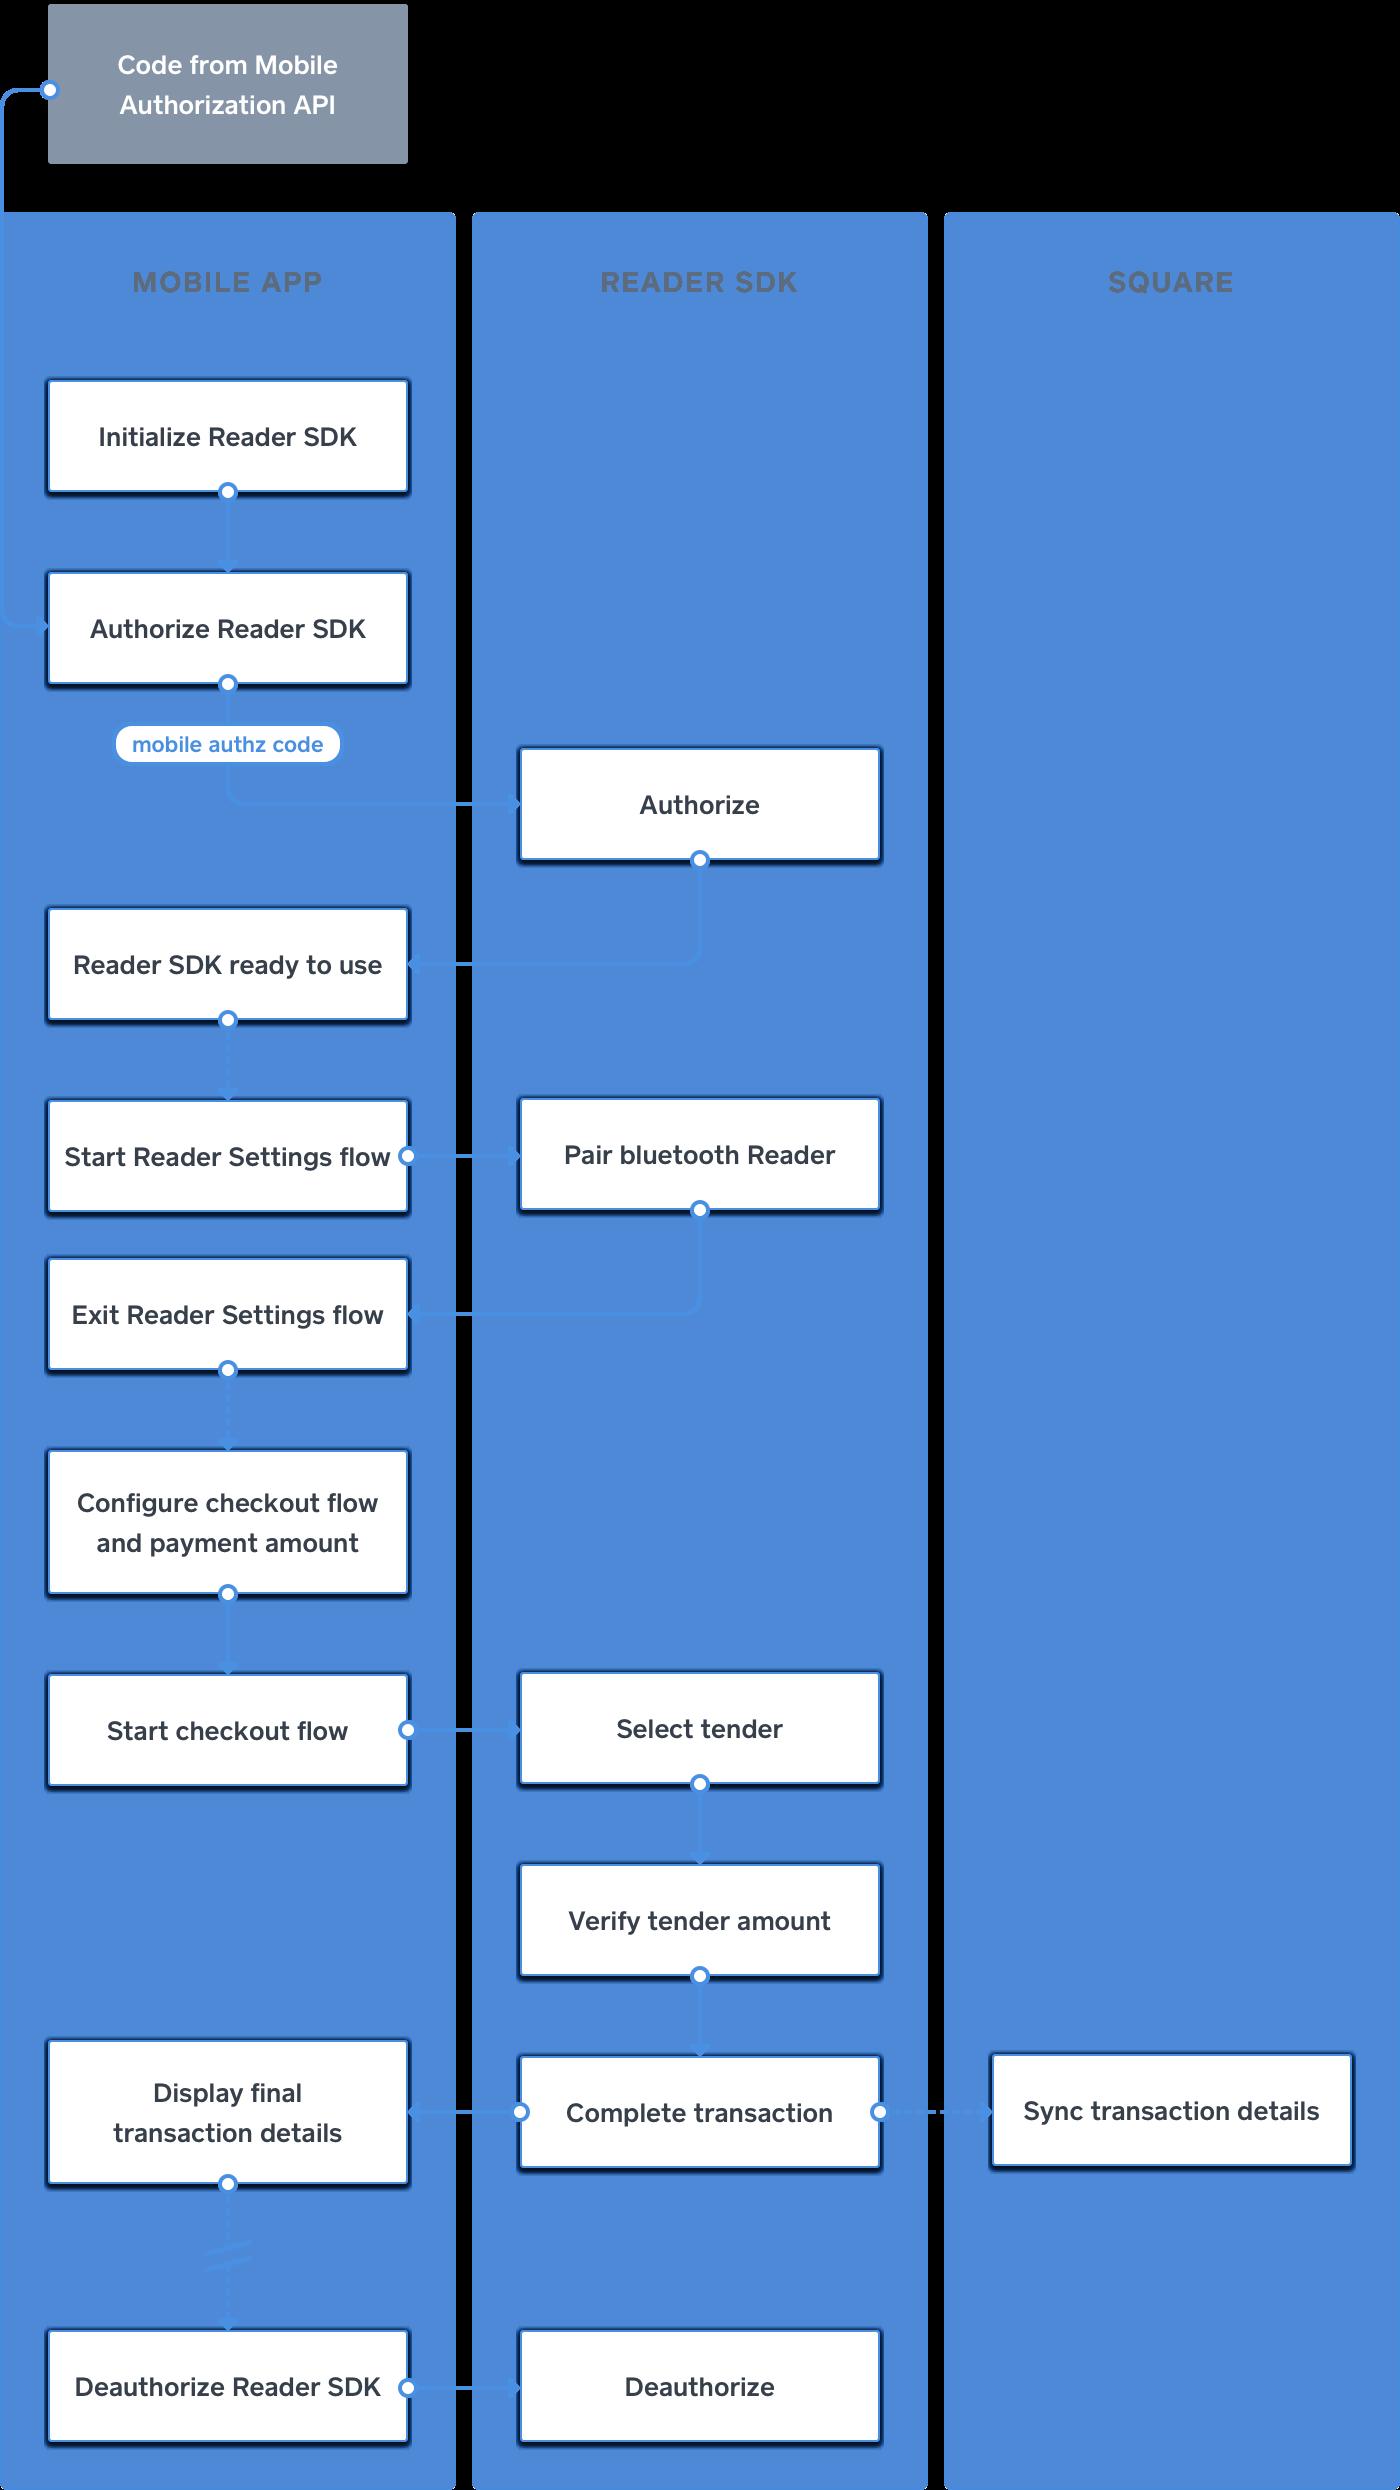 Readersdk process flow